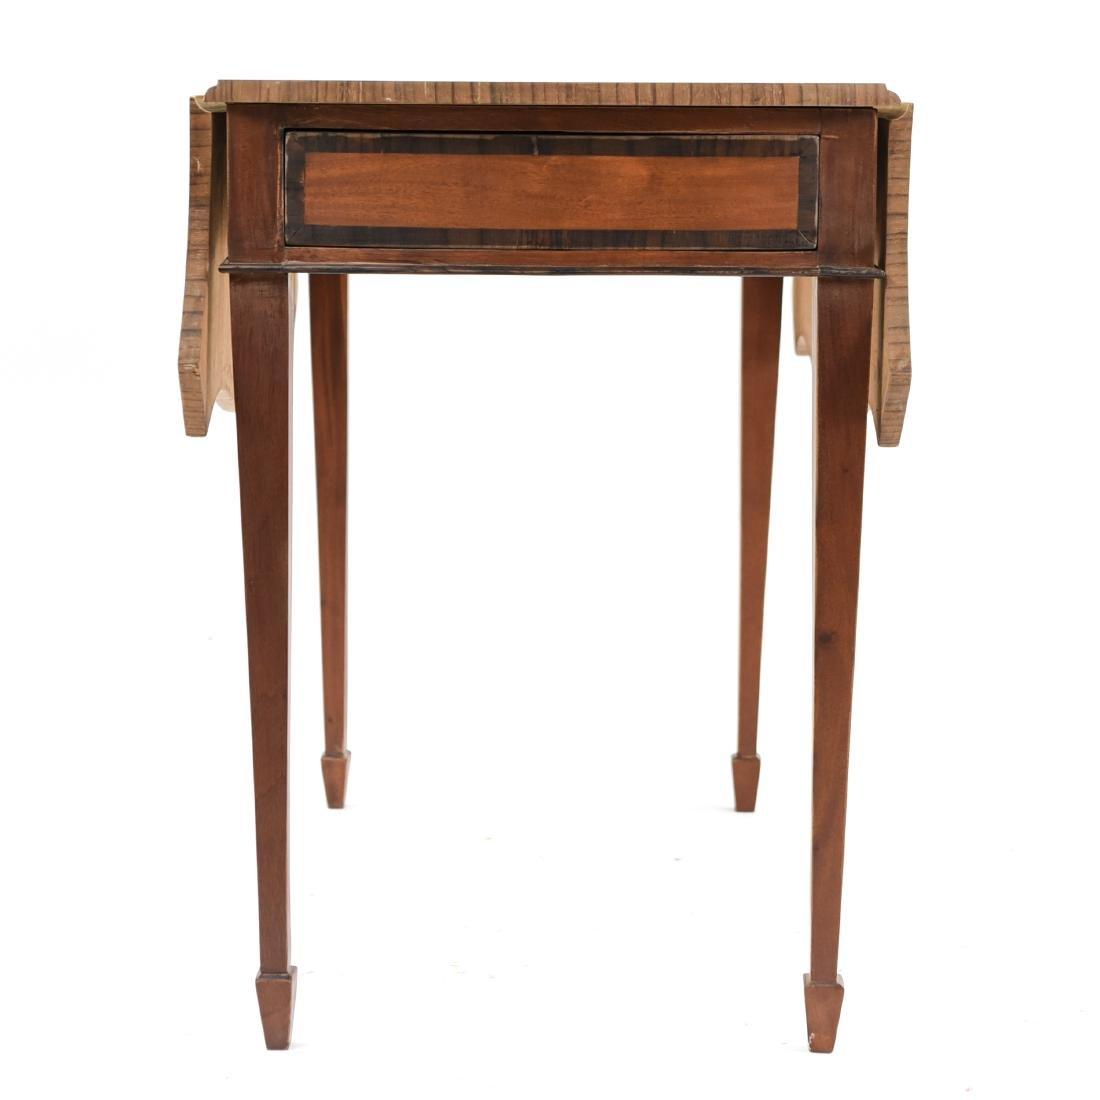 PEMBROKE TABLE - 3